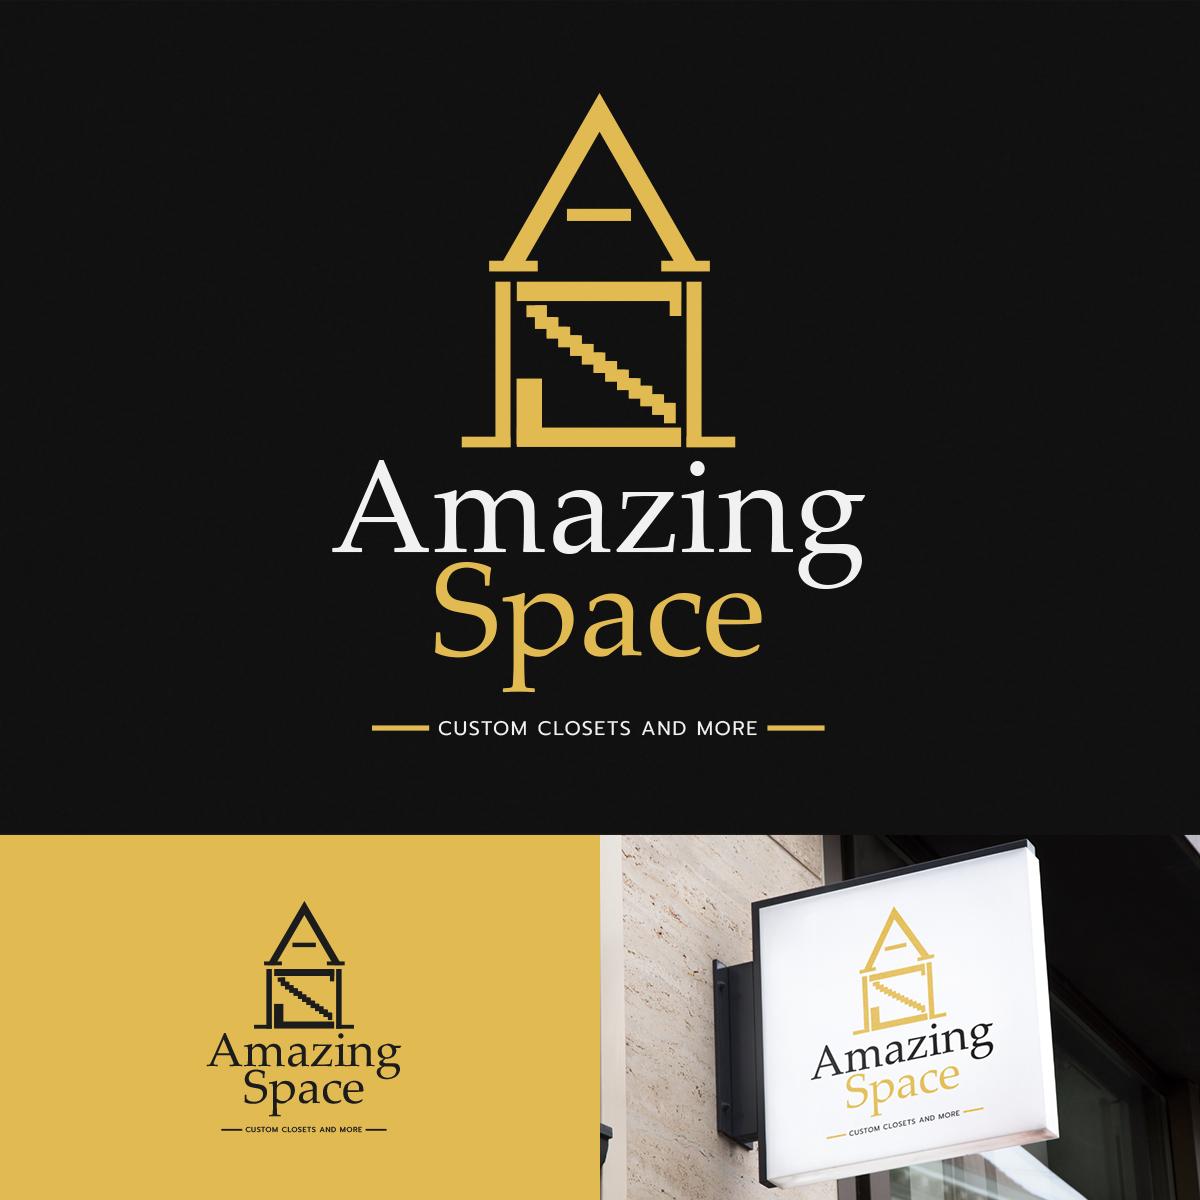 Incroyable Elegant, Serious, Garage Logo Design For Amazing Space In United States |  Design 17615825